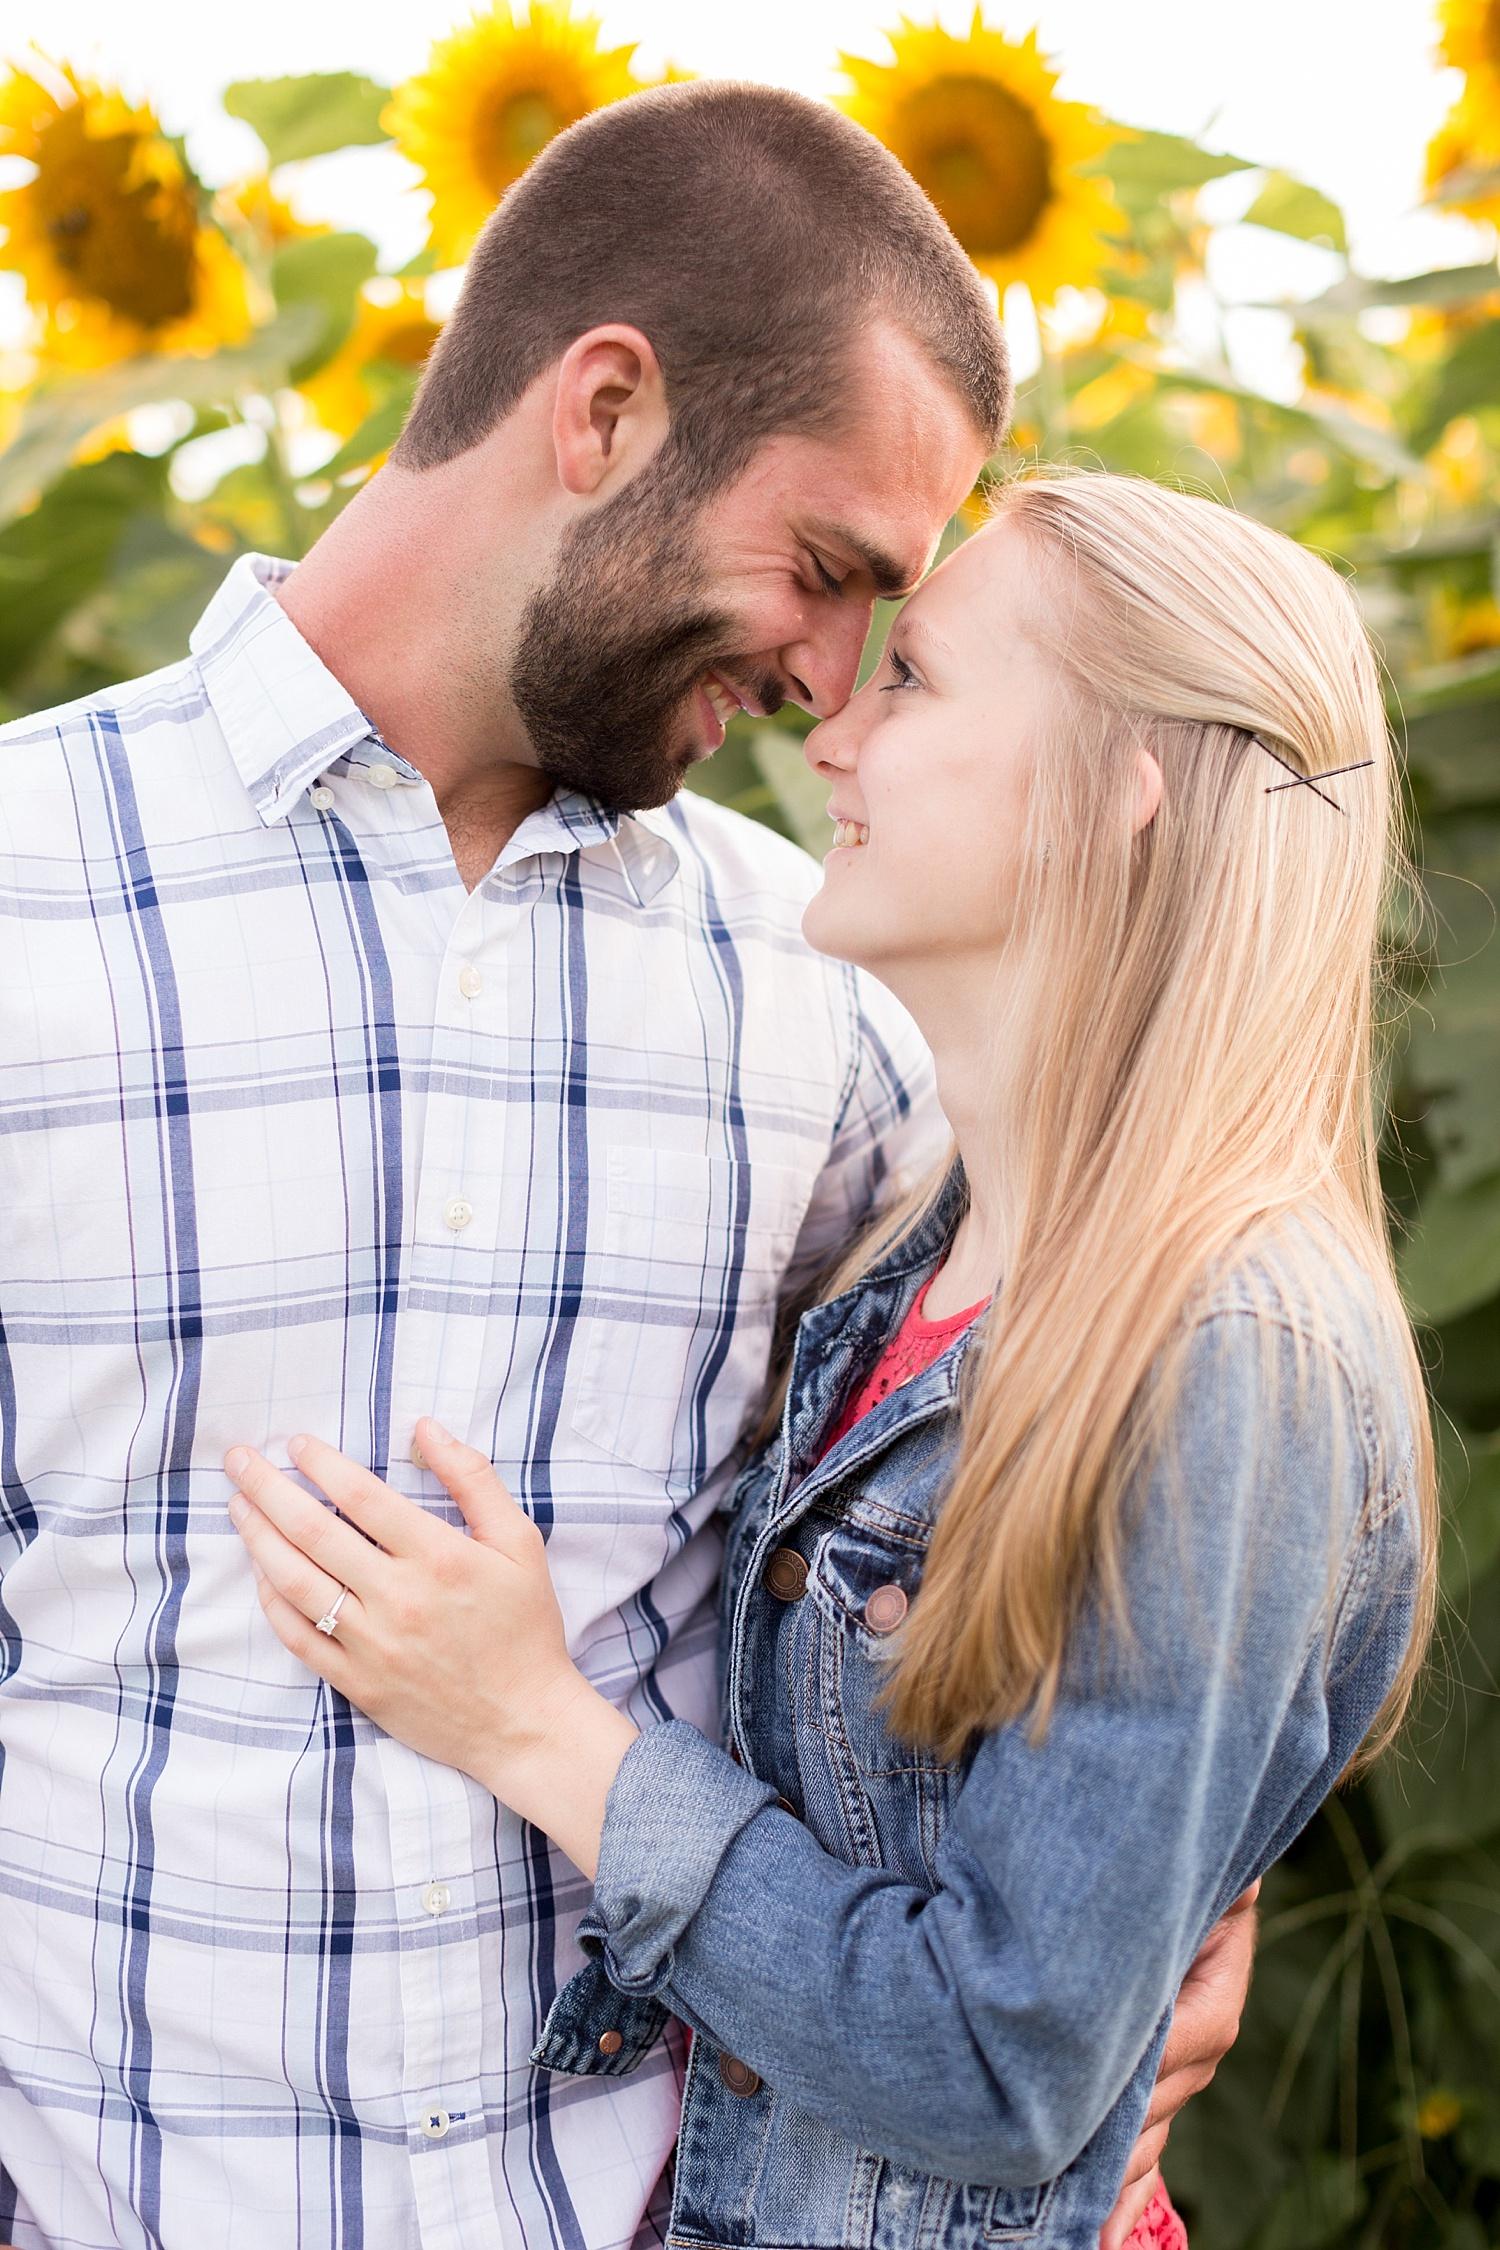 Romantic engagement session in sunflower field lancaster pa wedding photographer photo_0007.jpg